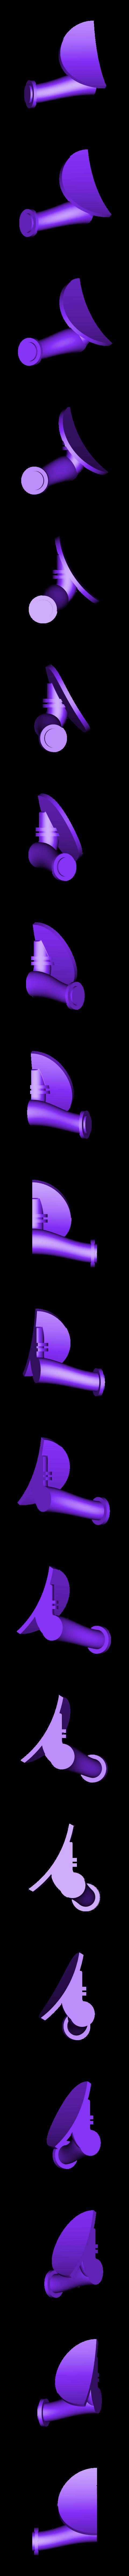 MirrorSteam_Pipe_Boiler-a.STL Download free STL file 4-8-8-4 Big Boy Locomotive • 3D printer object, RaymondDeLuca